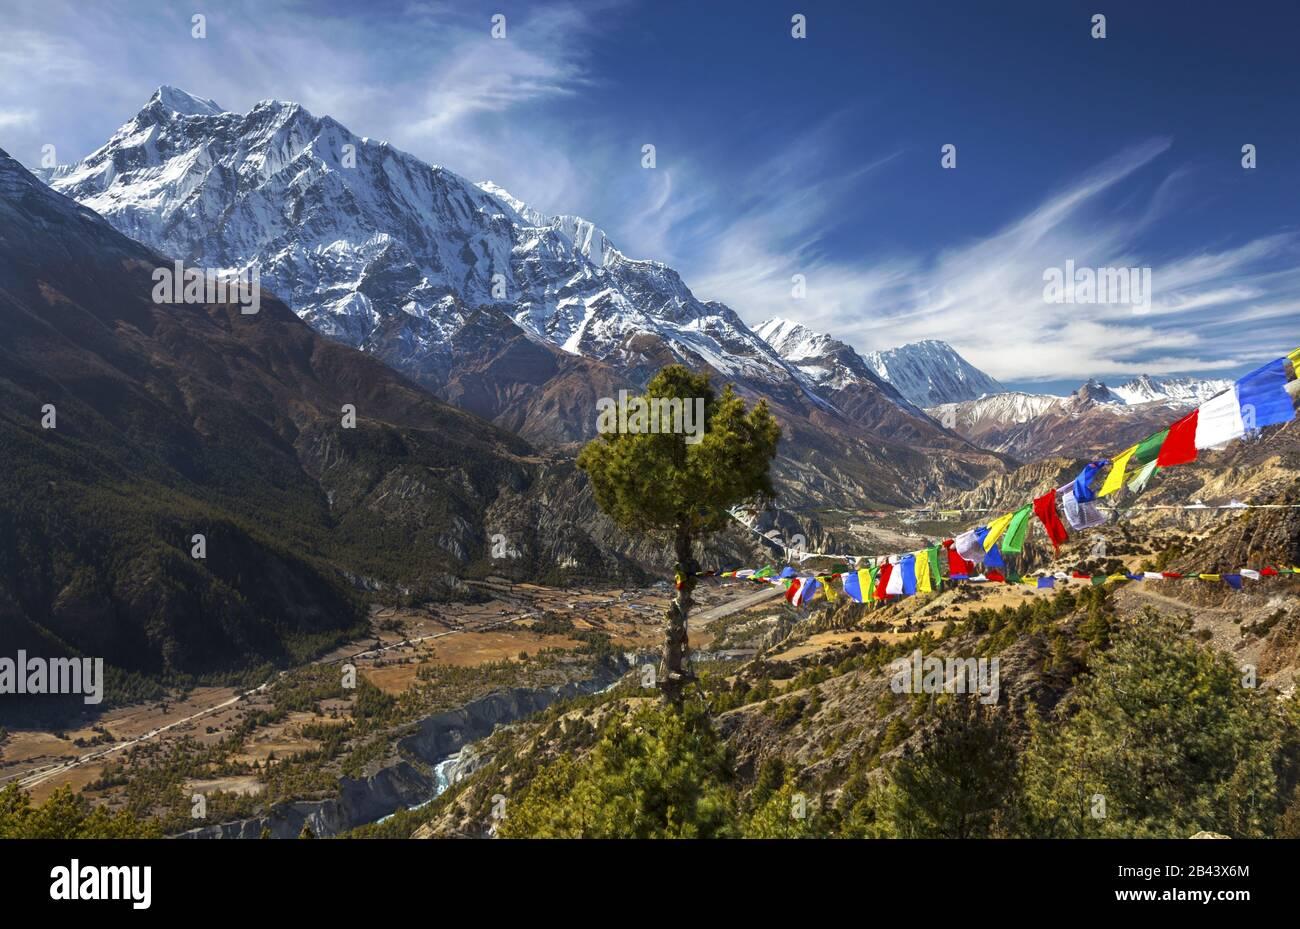 himalaya-mountain-range-landscape-scenic